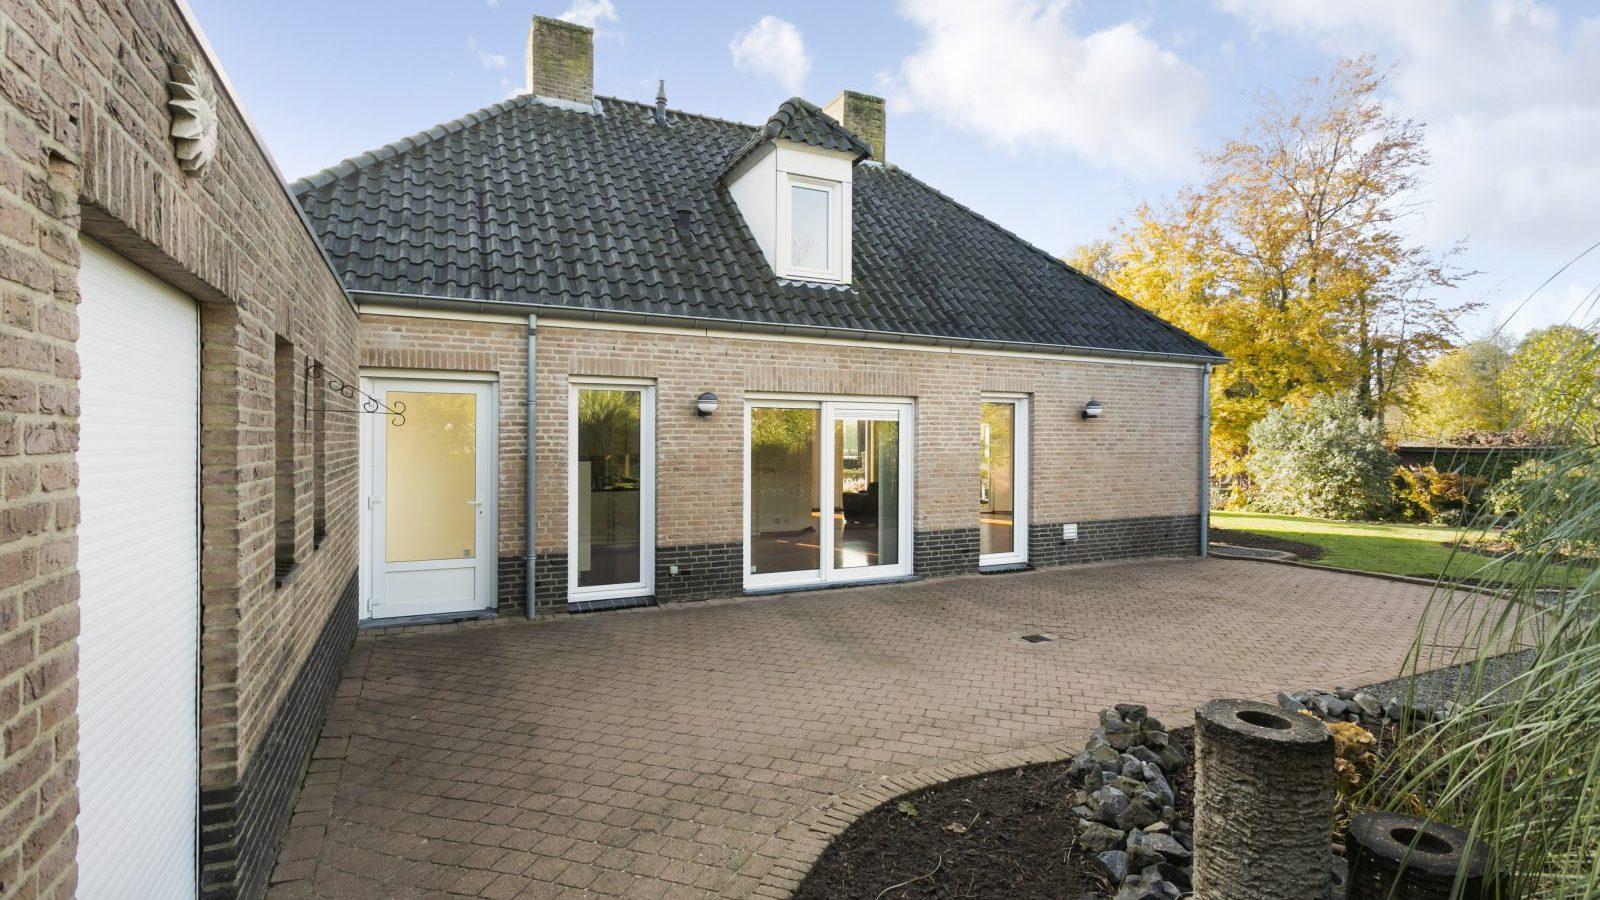 Beeckerhof6Swalmen-09-1600x1067